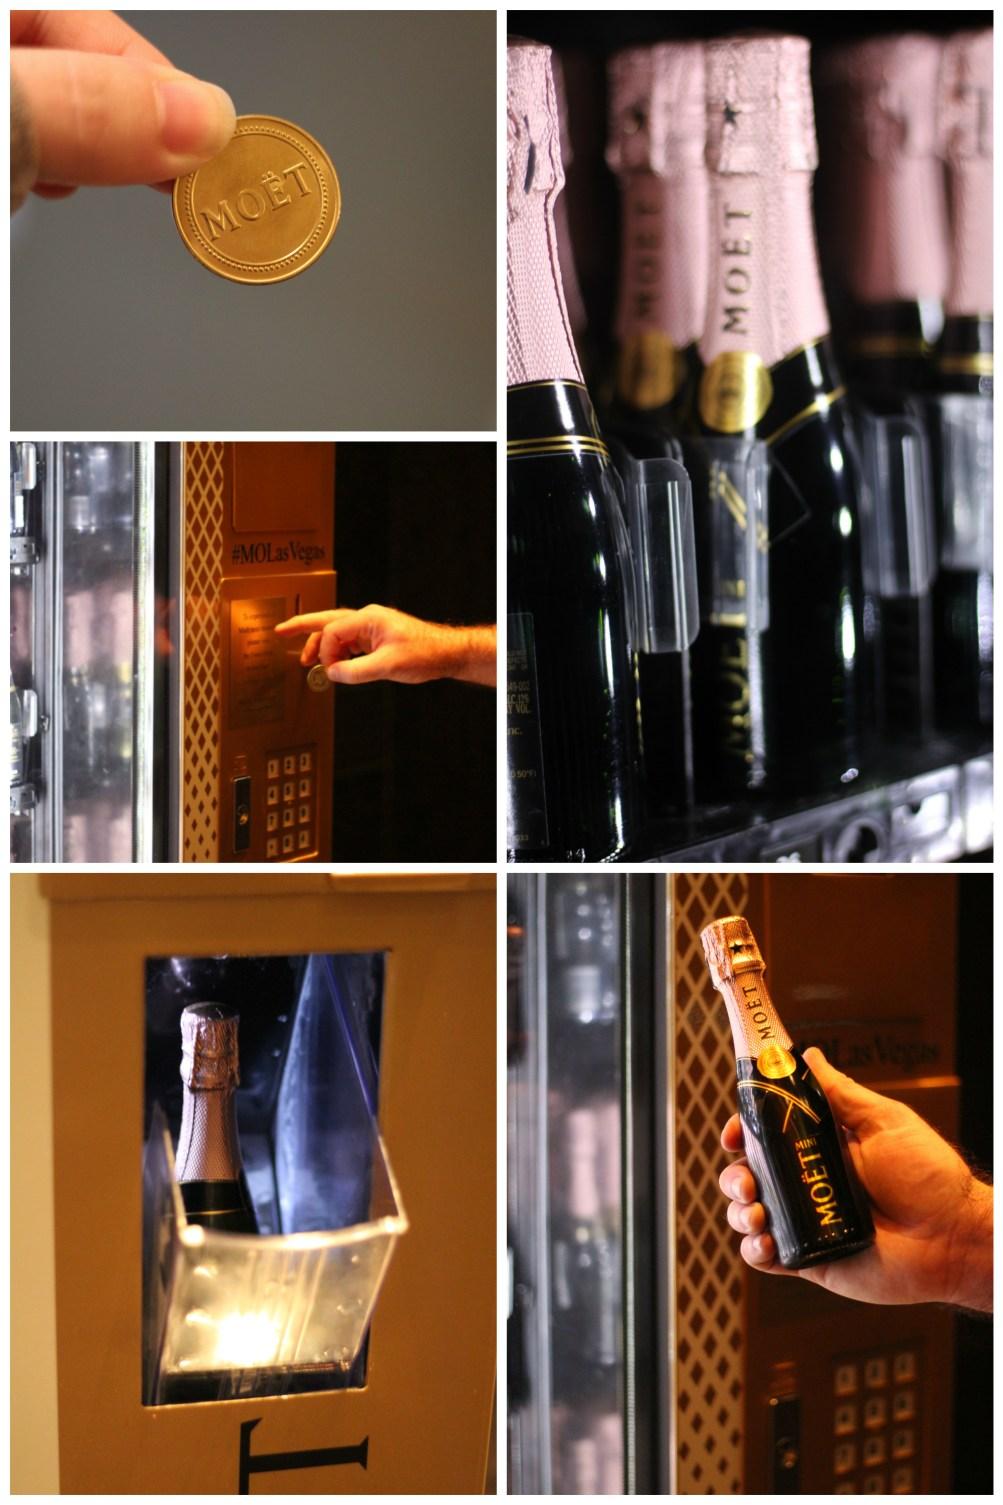 Las Vegas Vending Machines When S My Vacation